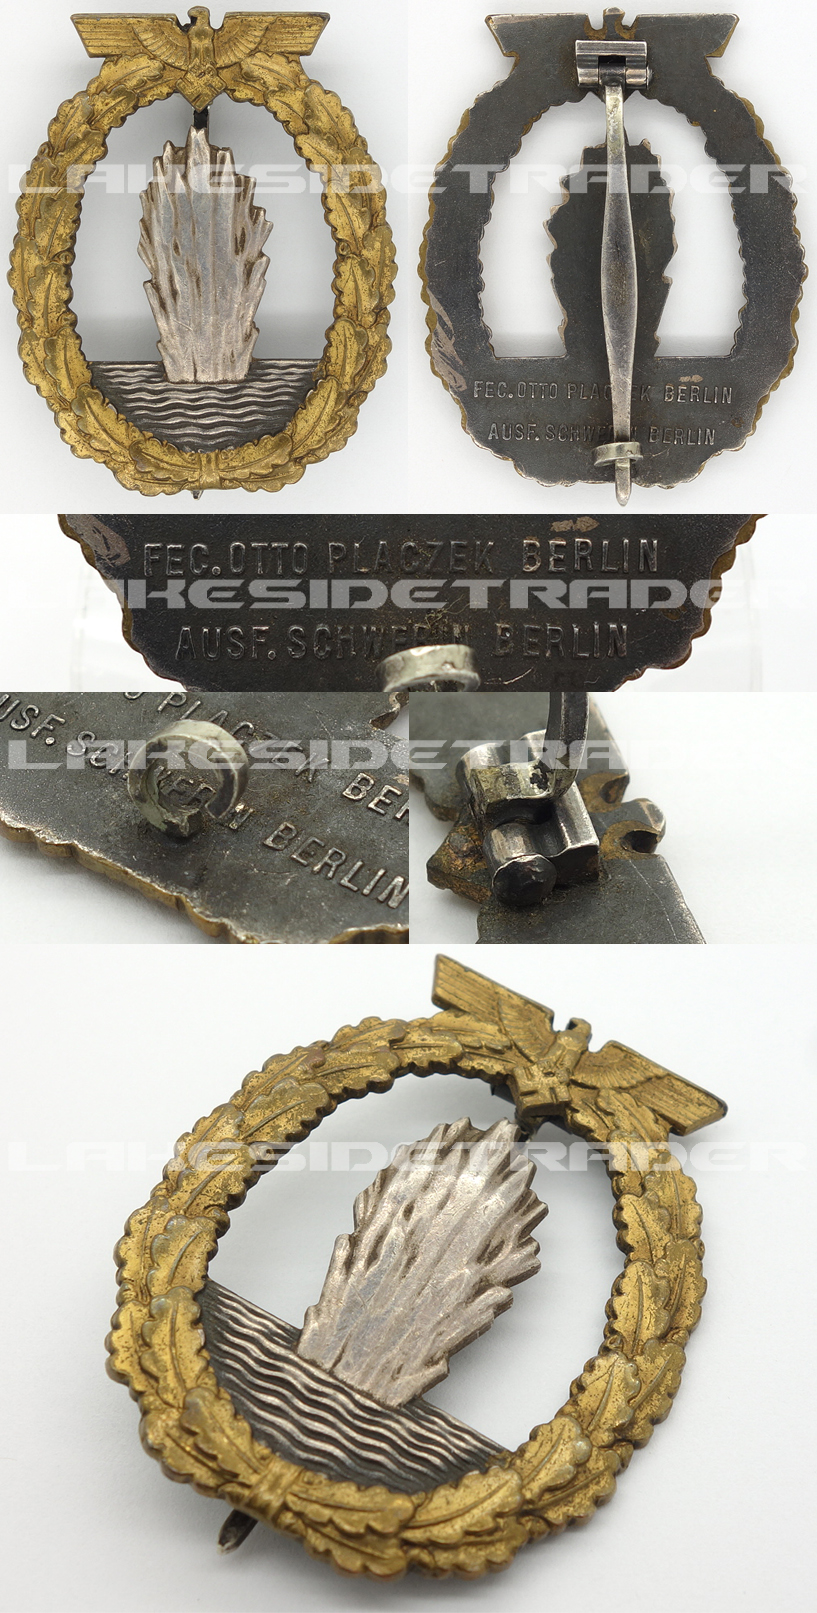 Navy Minesweeper Badge by Schwerin